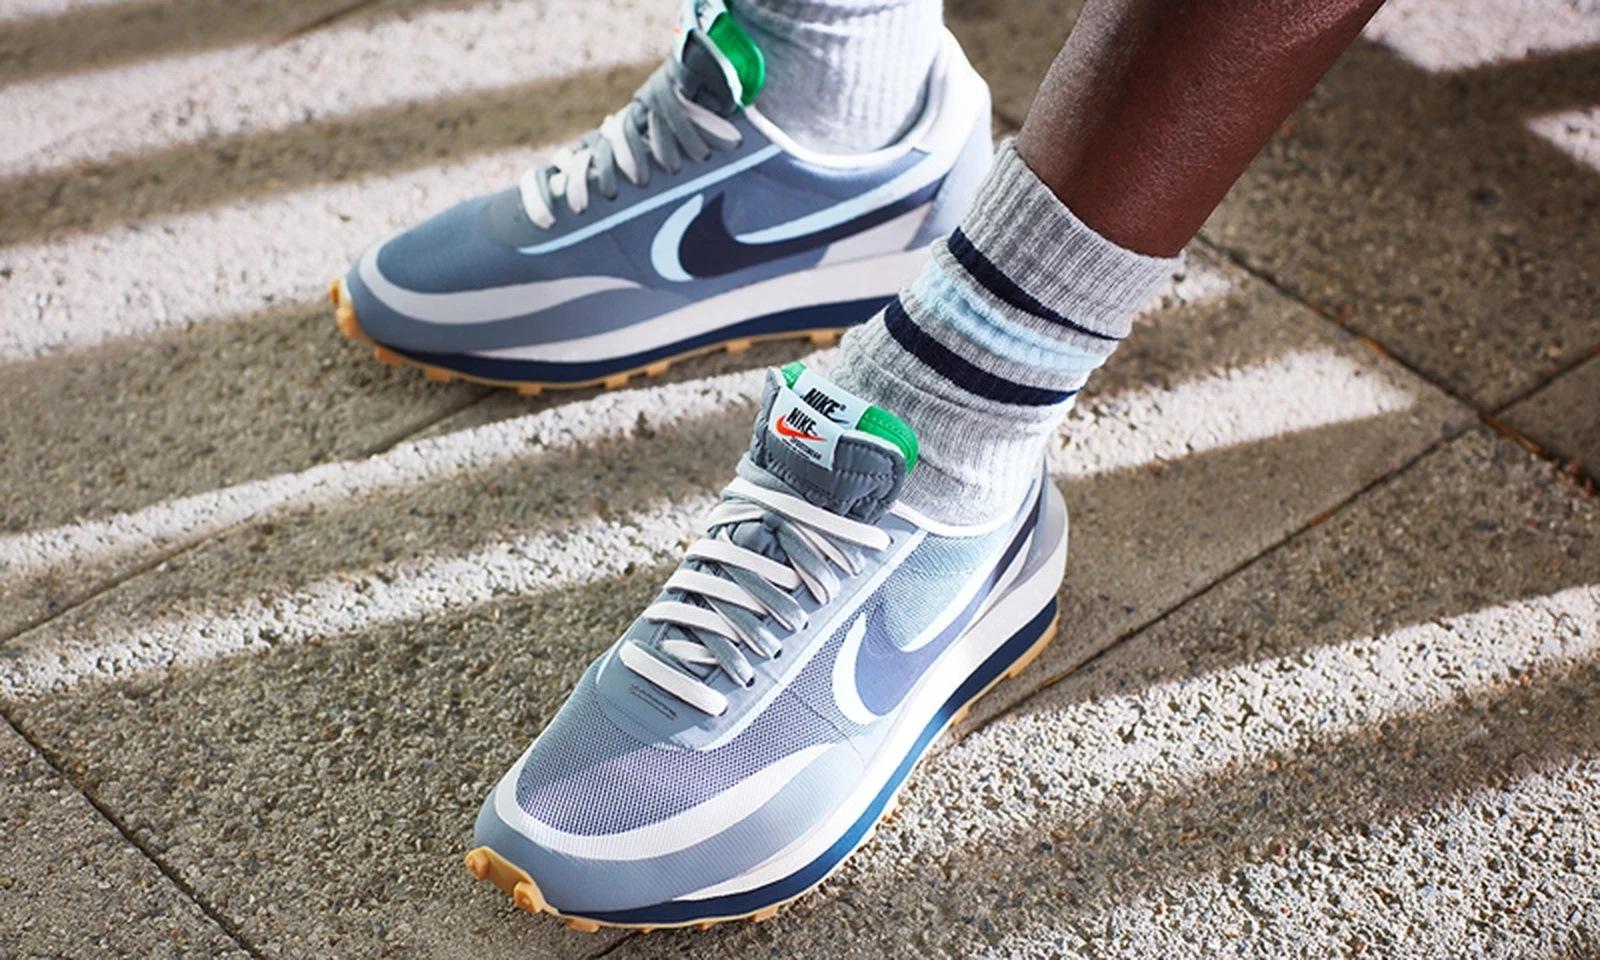 CLOT x Sacai x Nike LDWaffle Grey